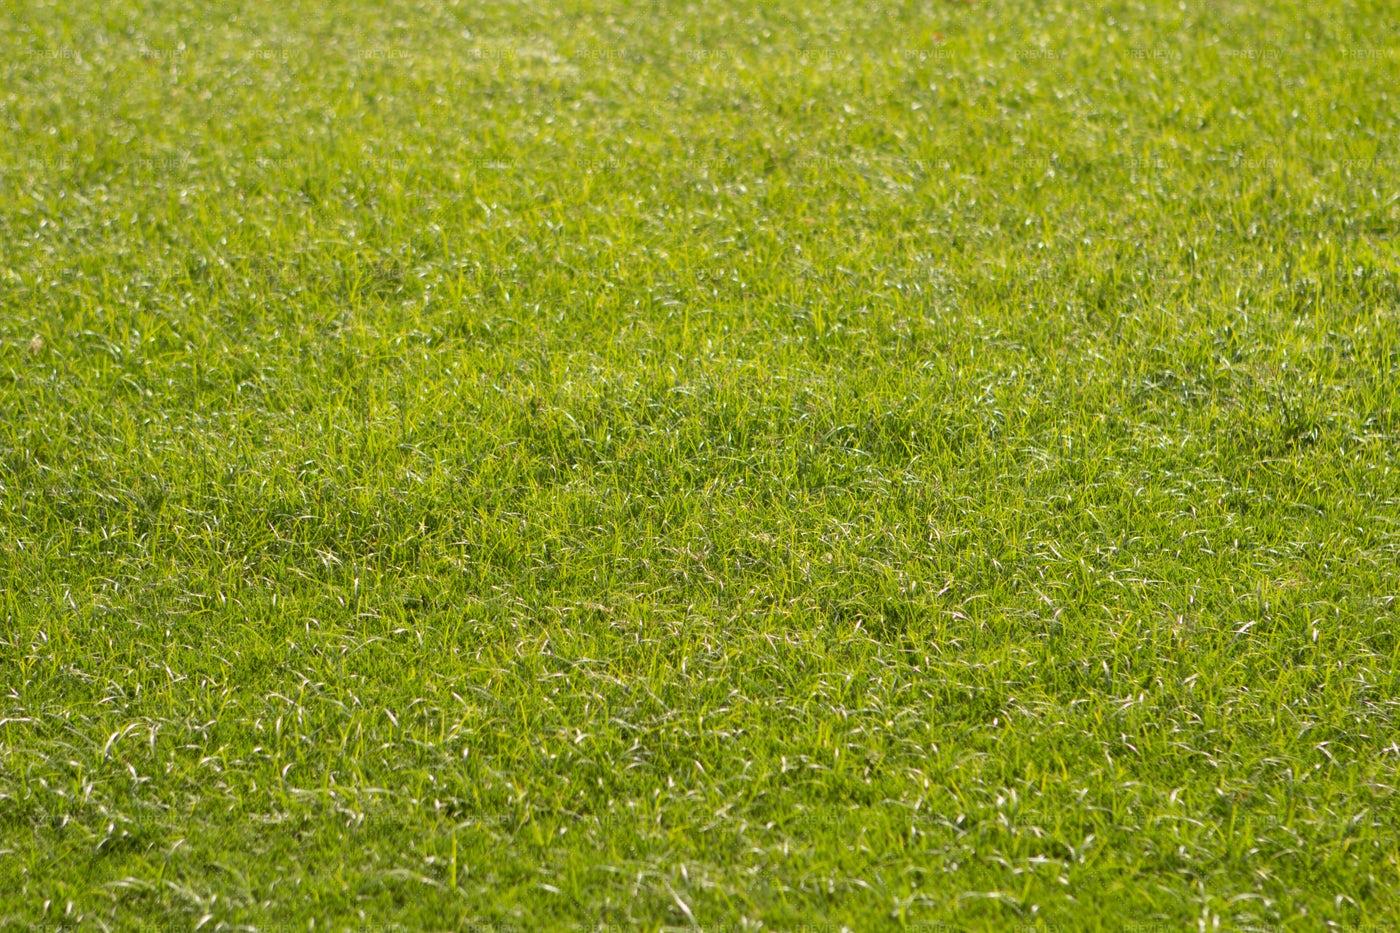 Freshly Cut Green Grass: Stock Photos